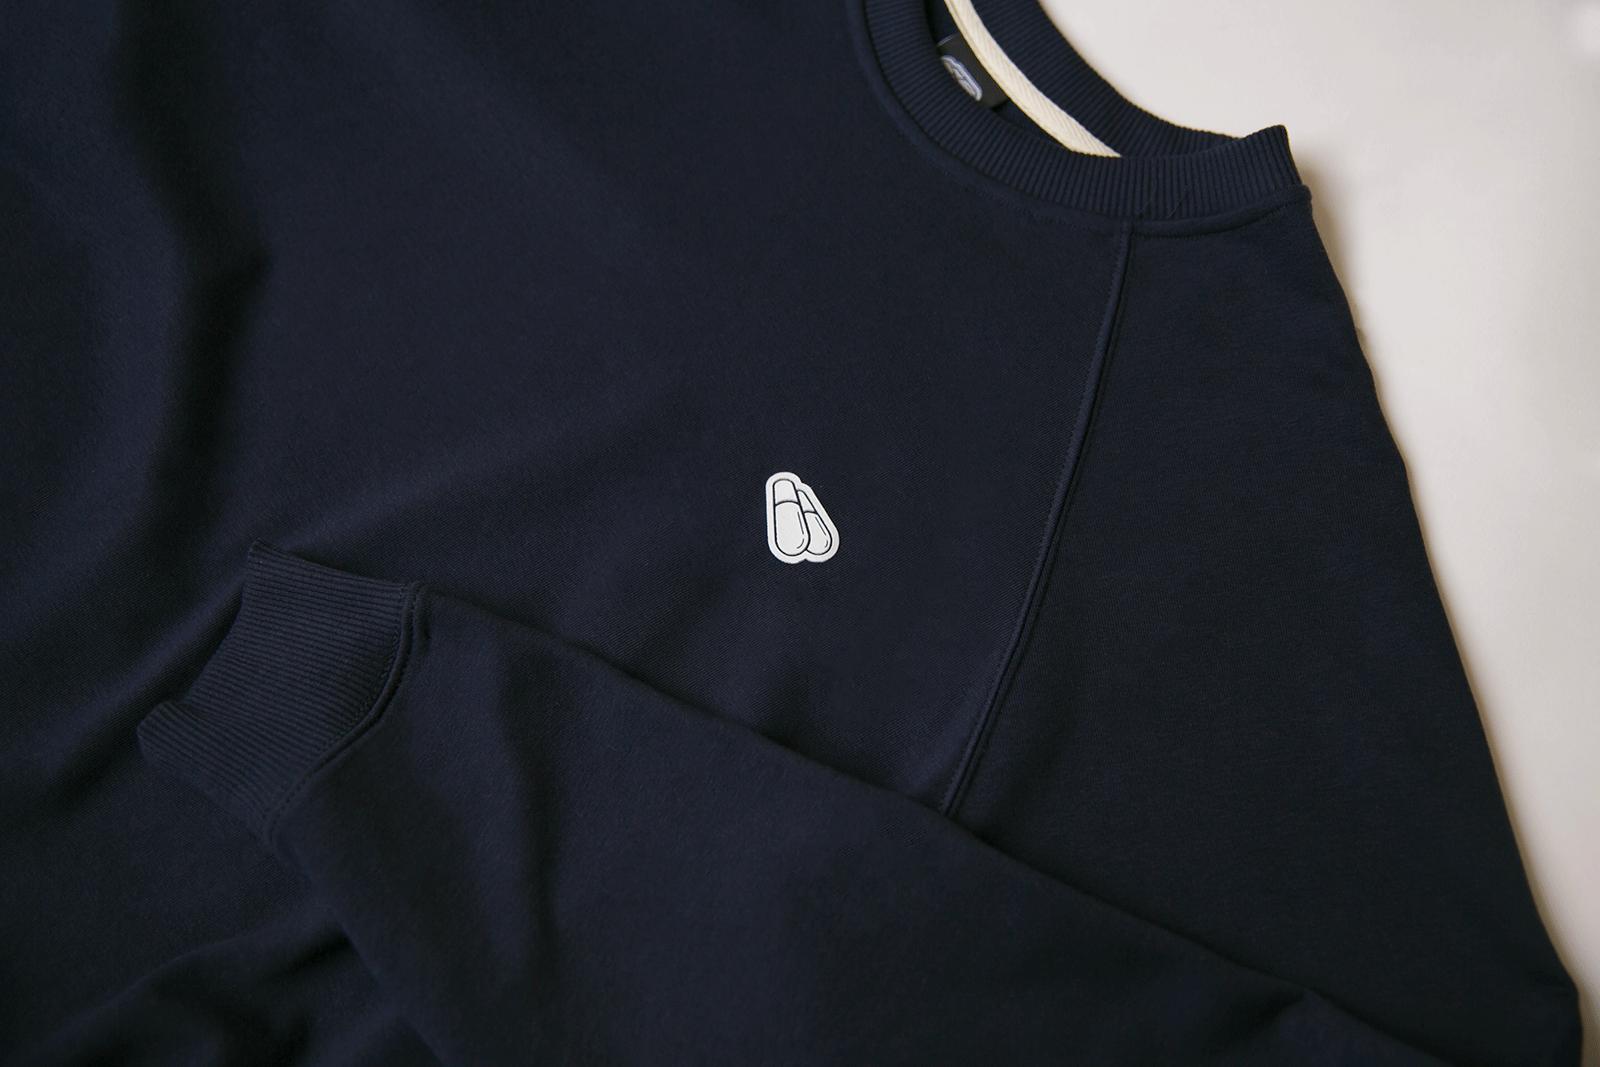 Детали логотипа на свитшоте 3D синего цвета PILLS WHEELS